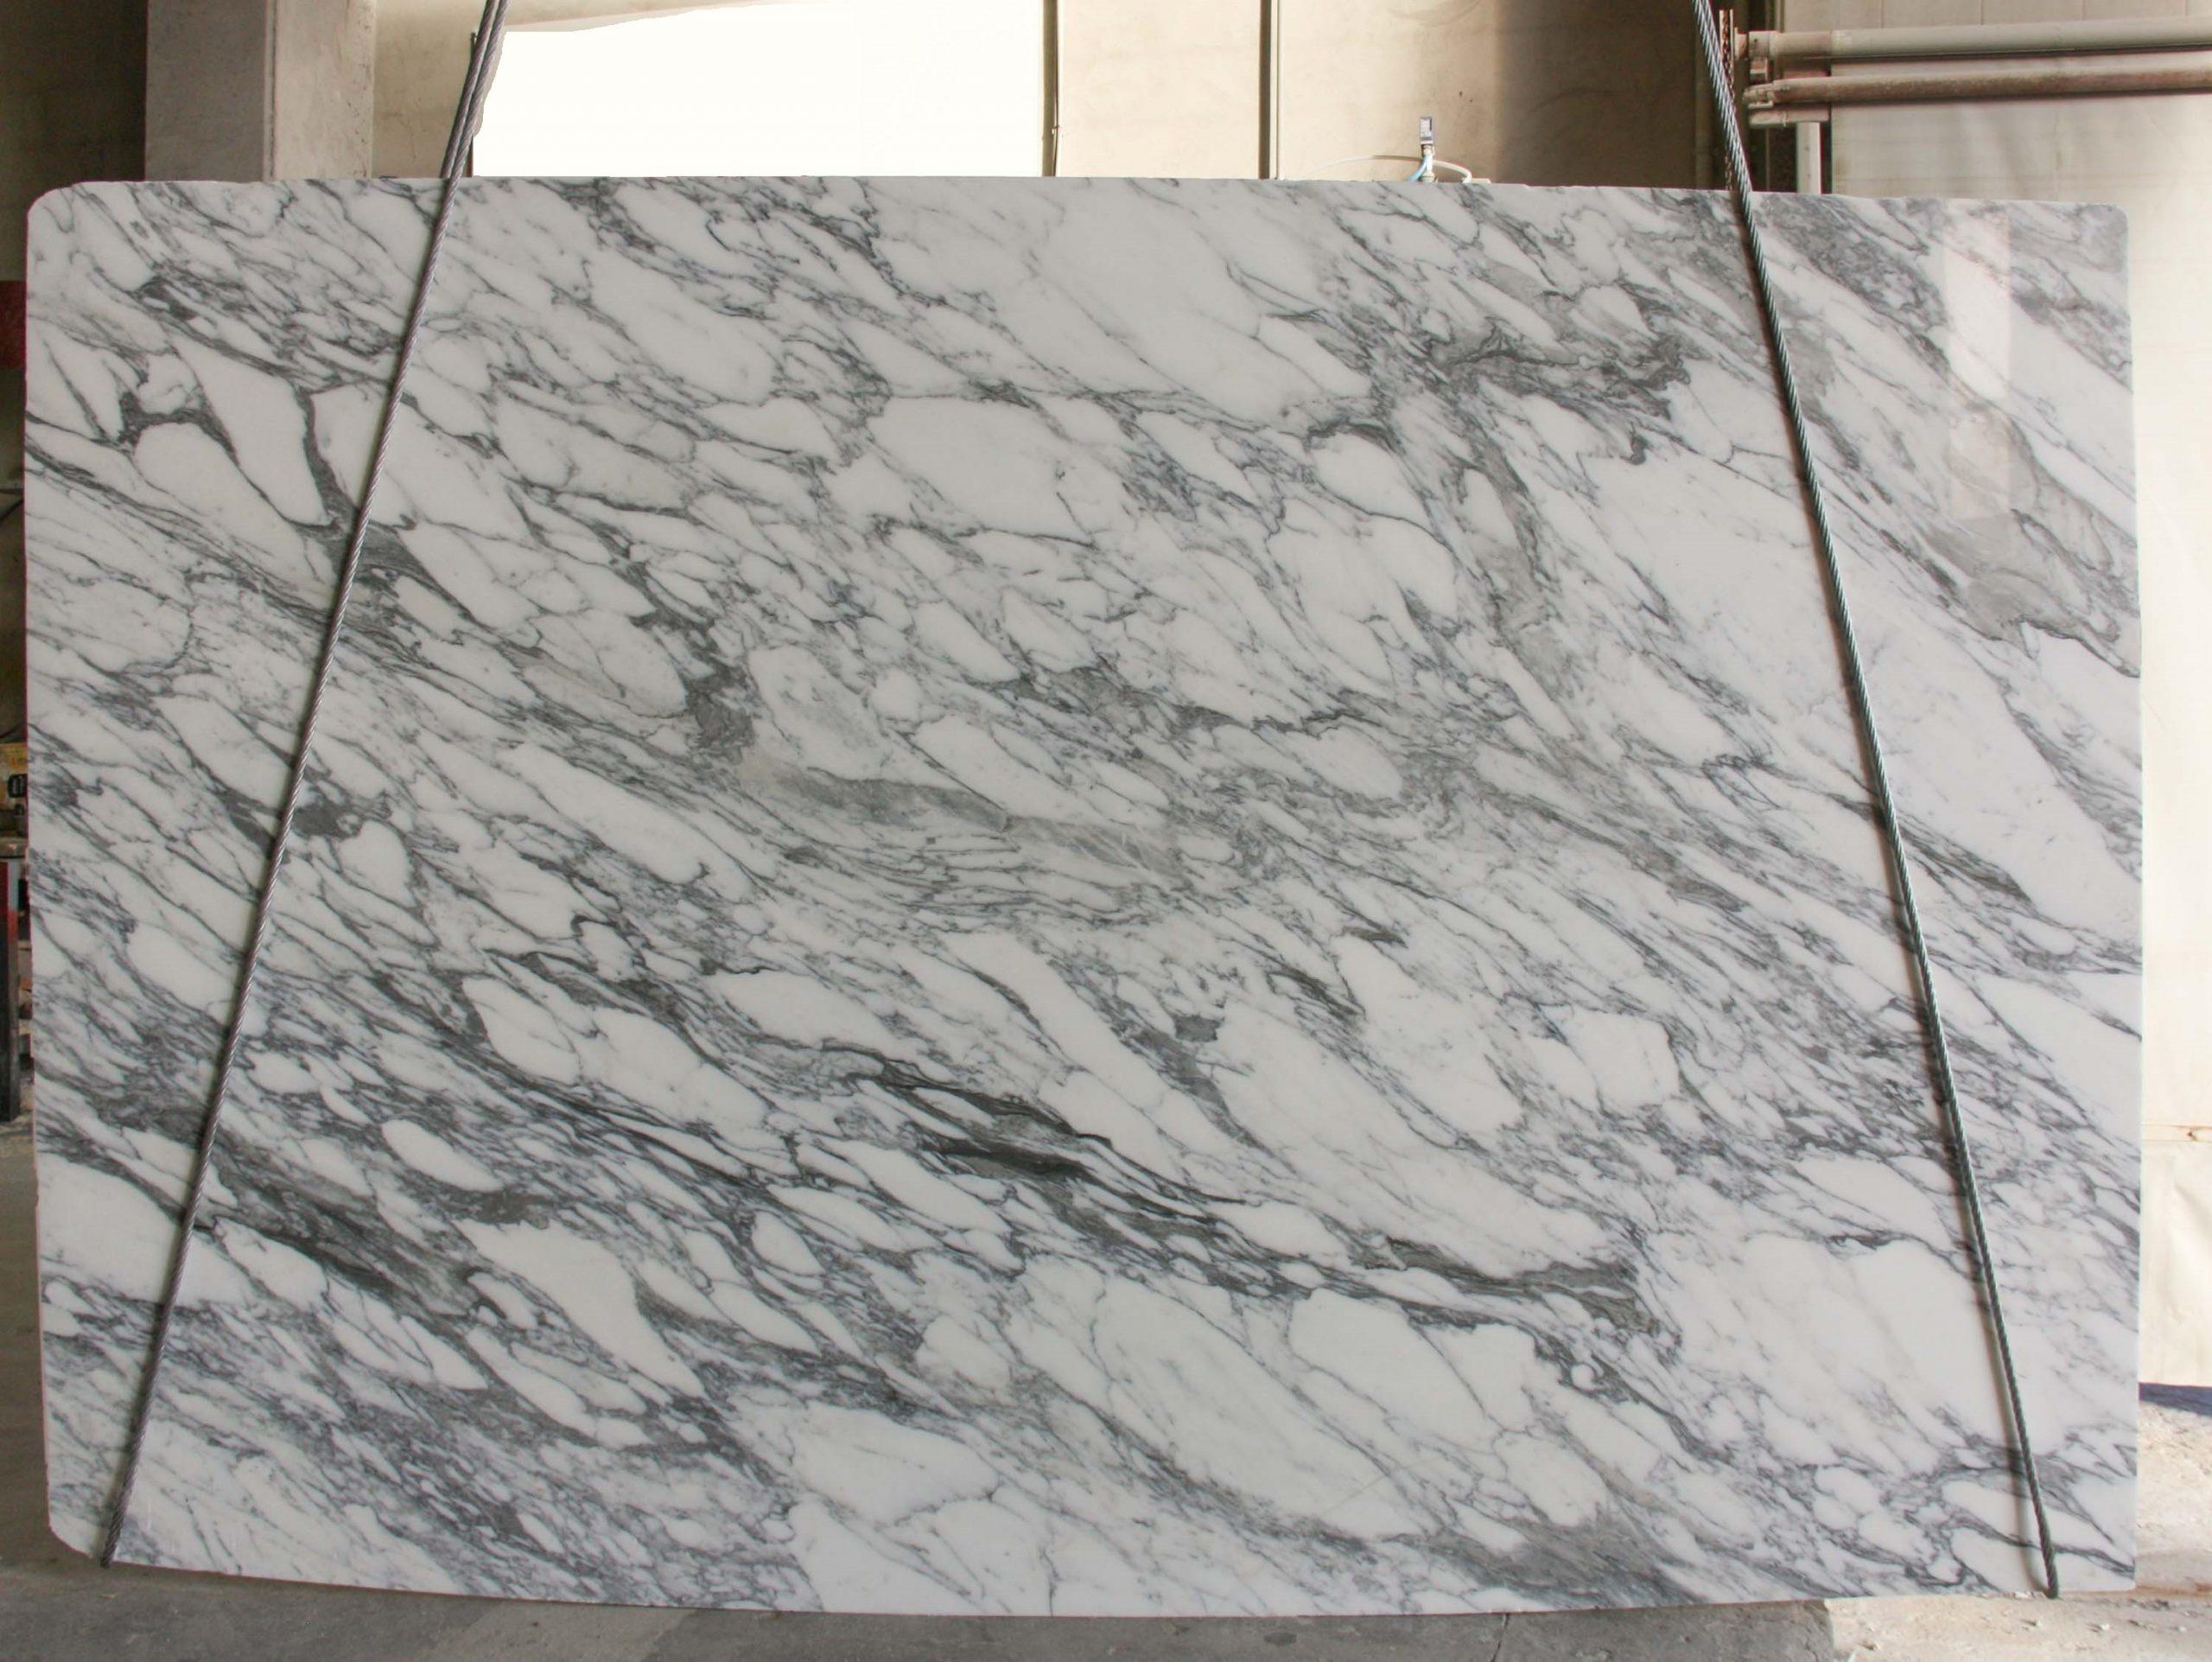 Arabescato Carrara Slabs Marble Trend Marble Granite